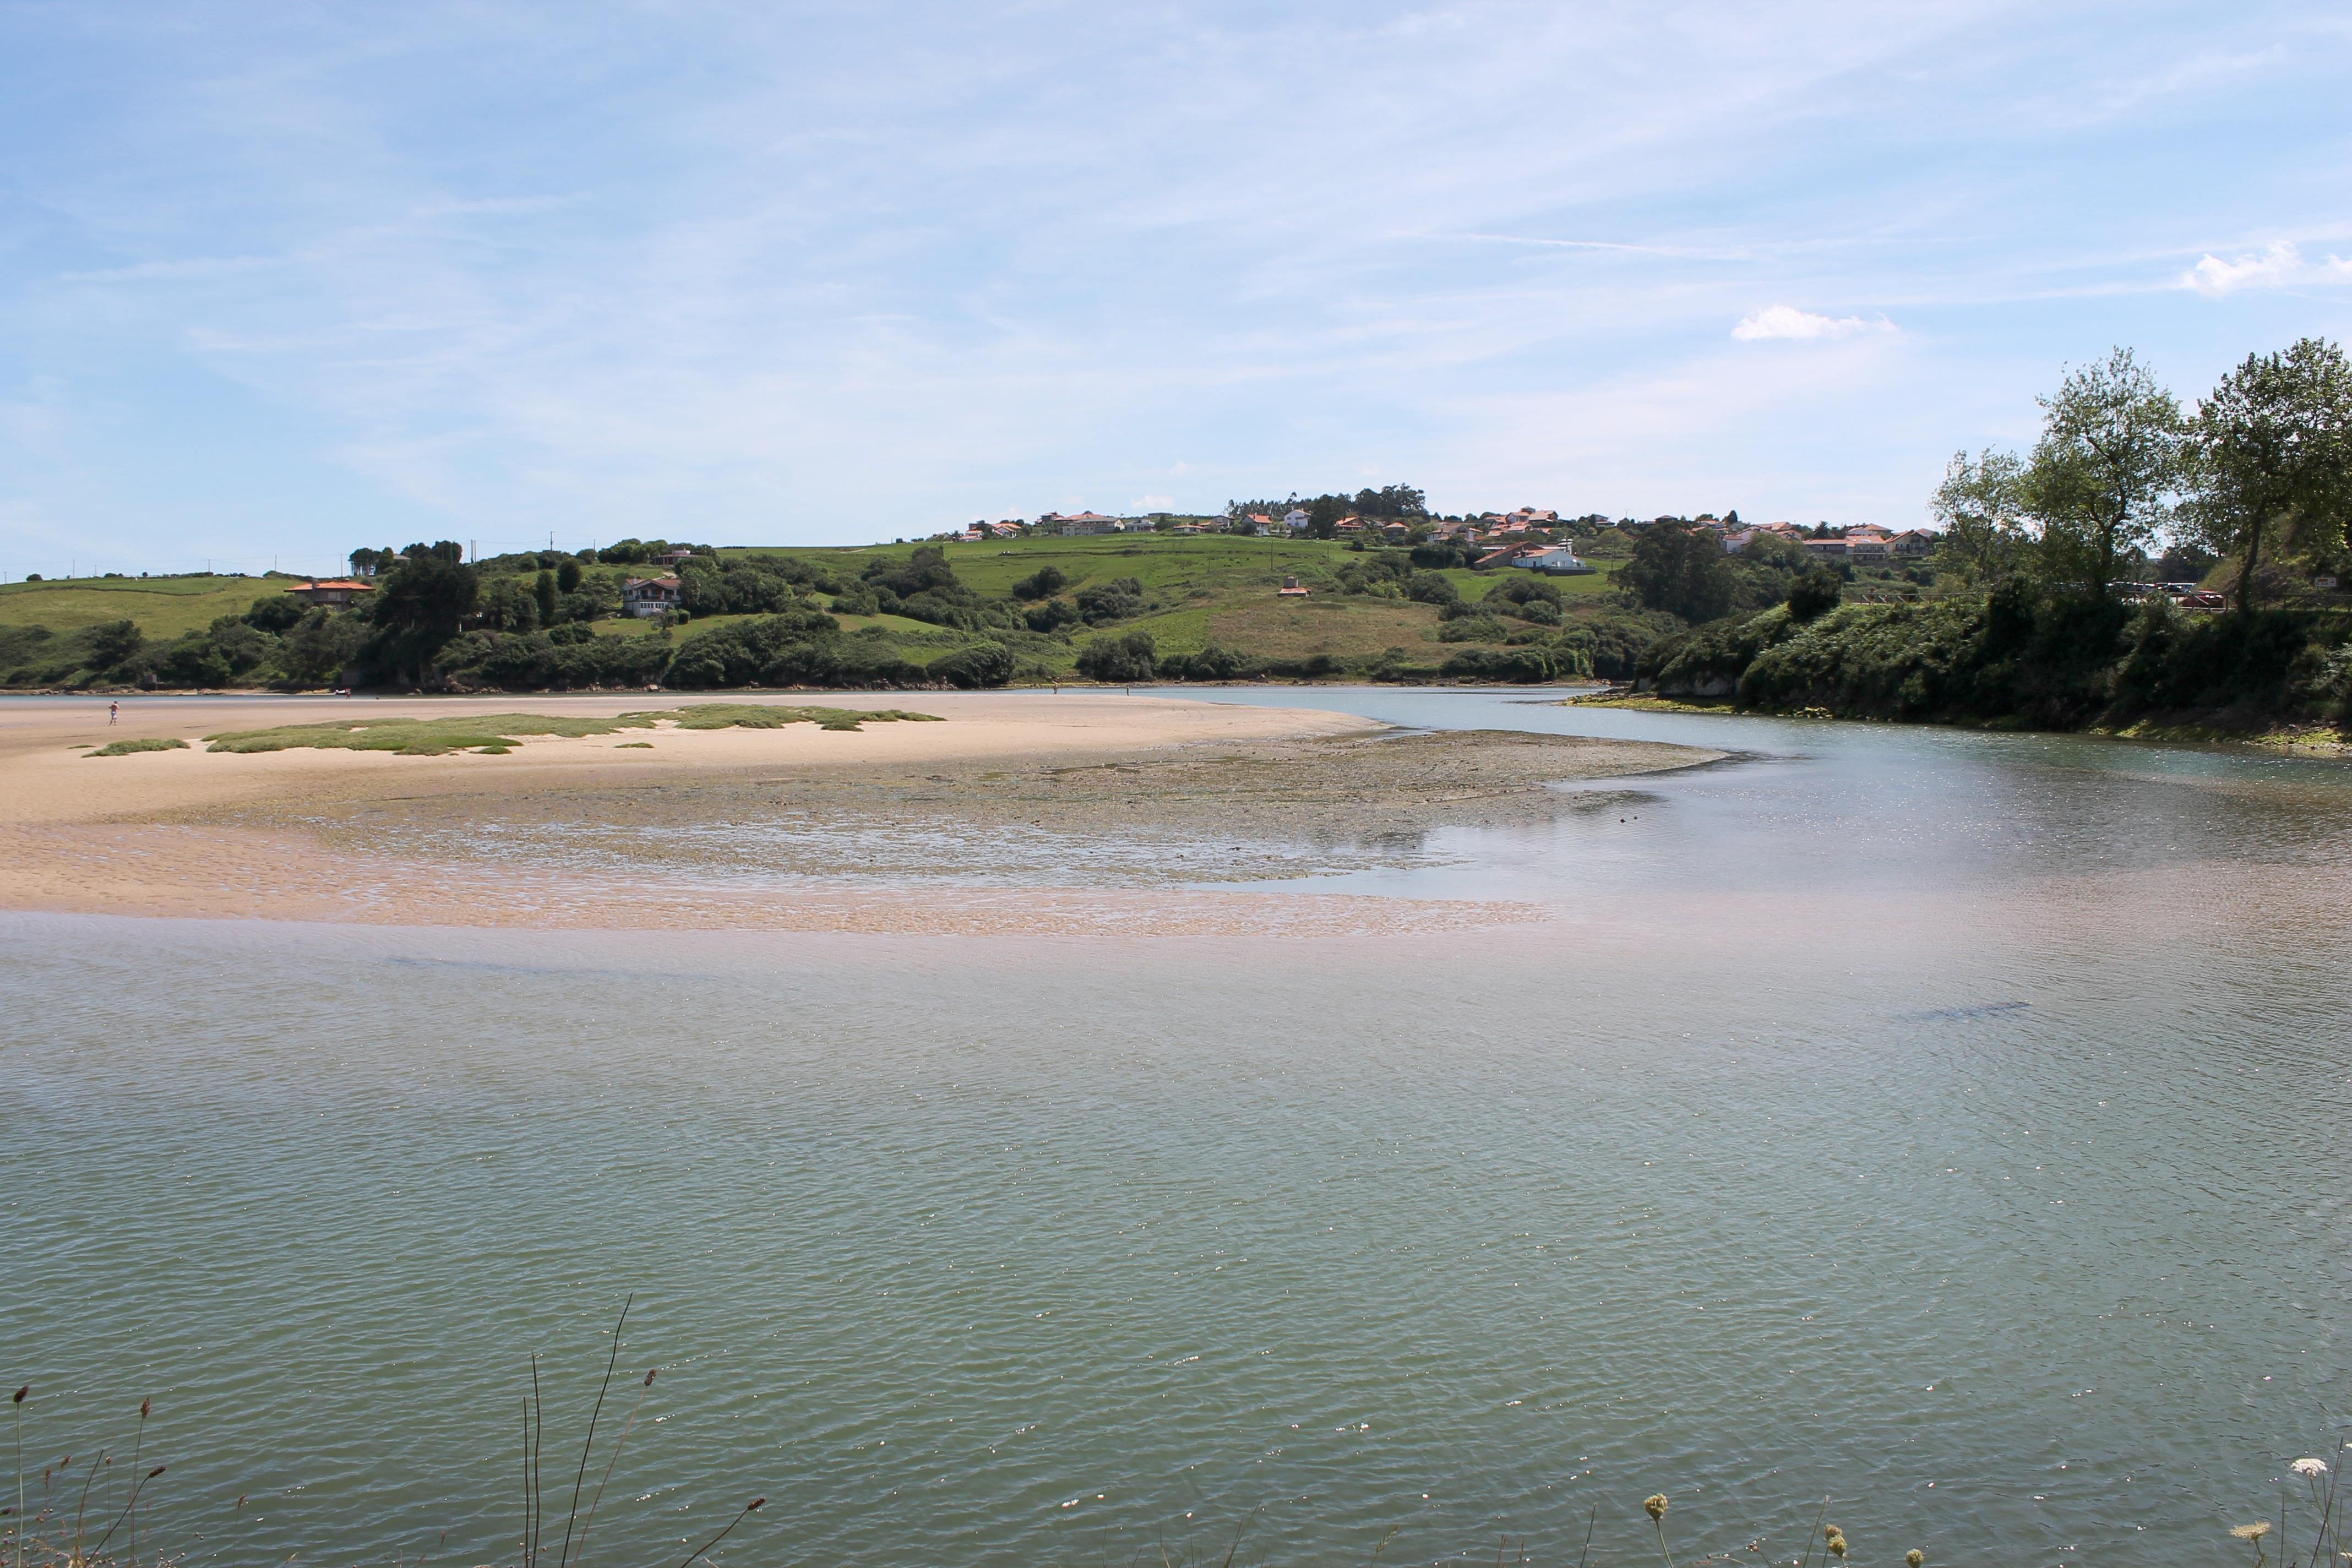 Free Images : Beach, Landscape, Sea, Coast, Shore, Lake